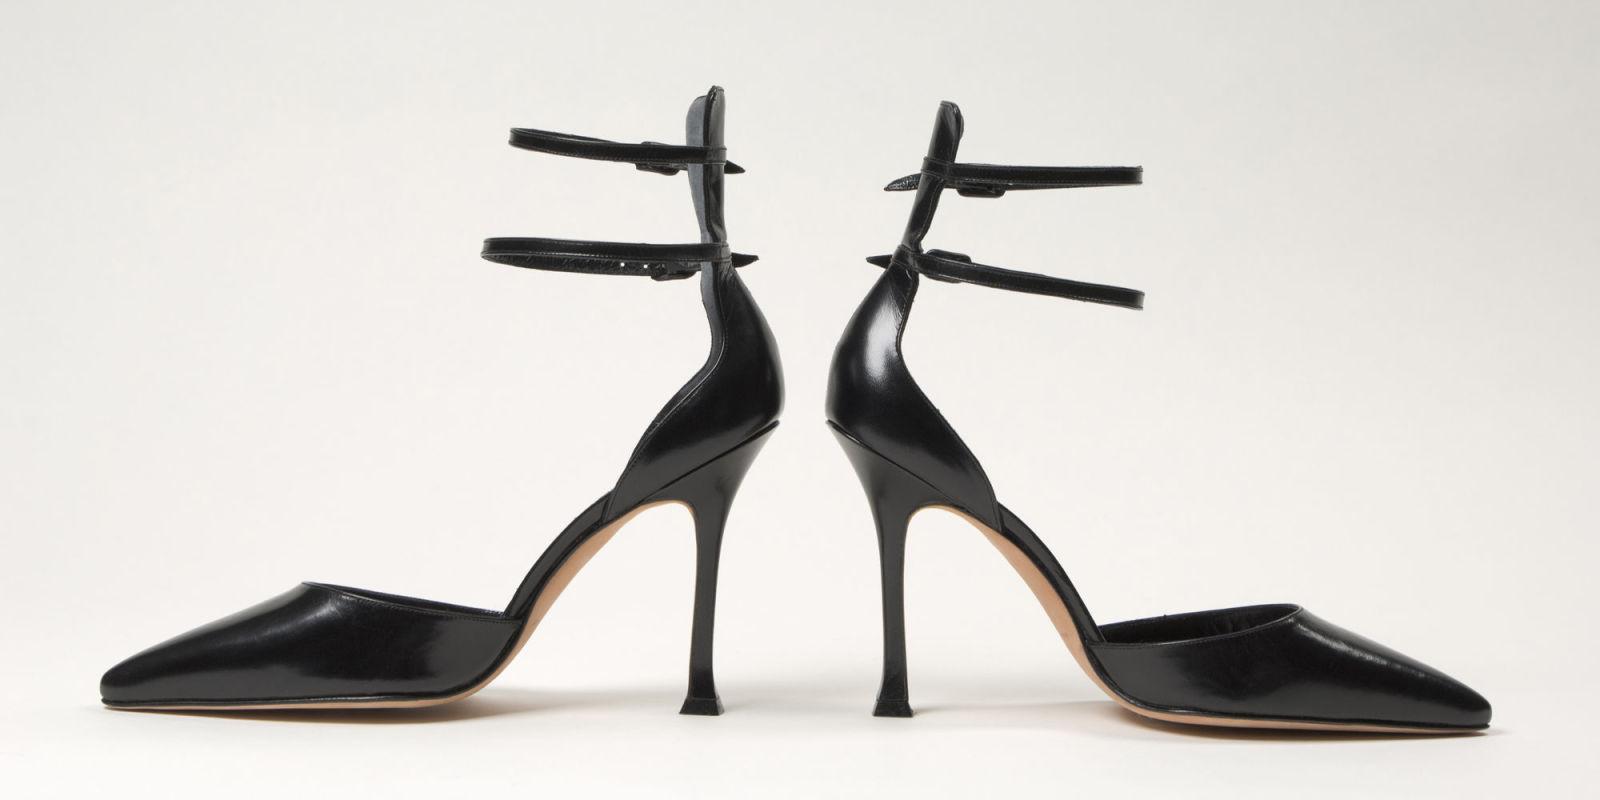 Manolo blahnik talks fashion life and walking in heels for Shoe designer manolo blahnik